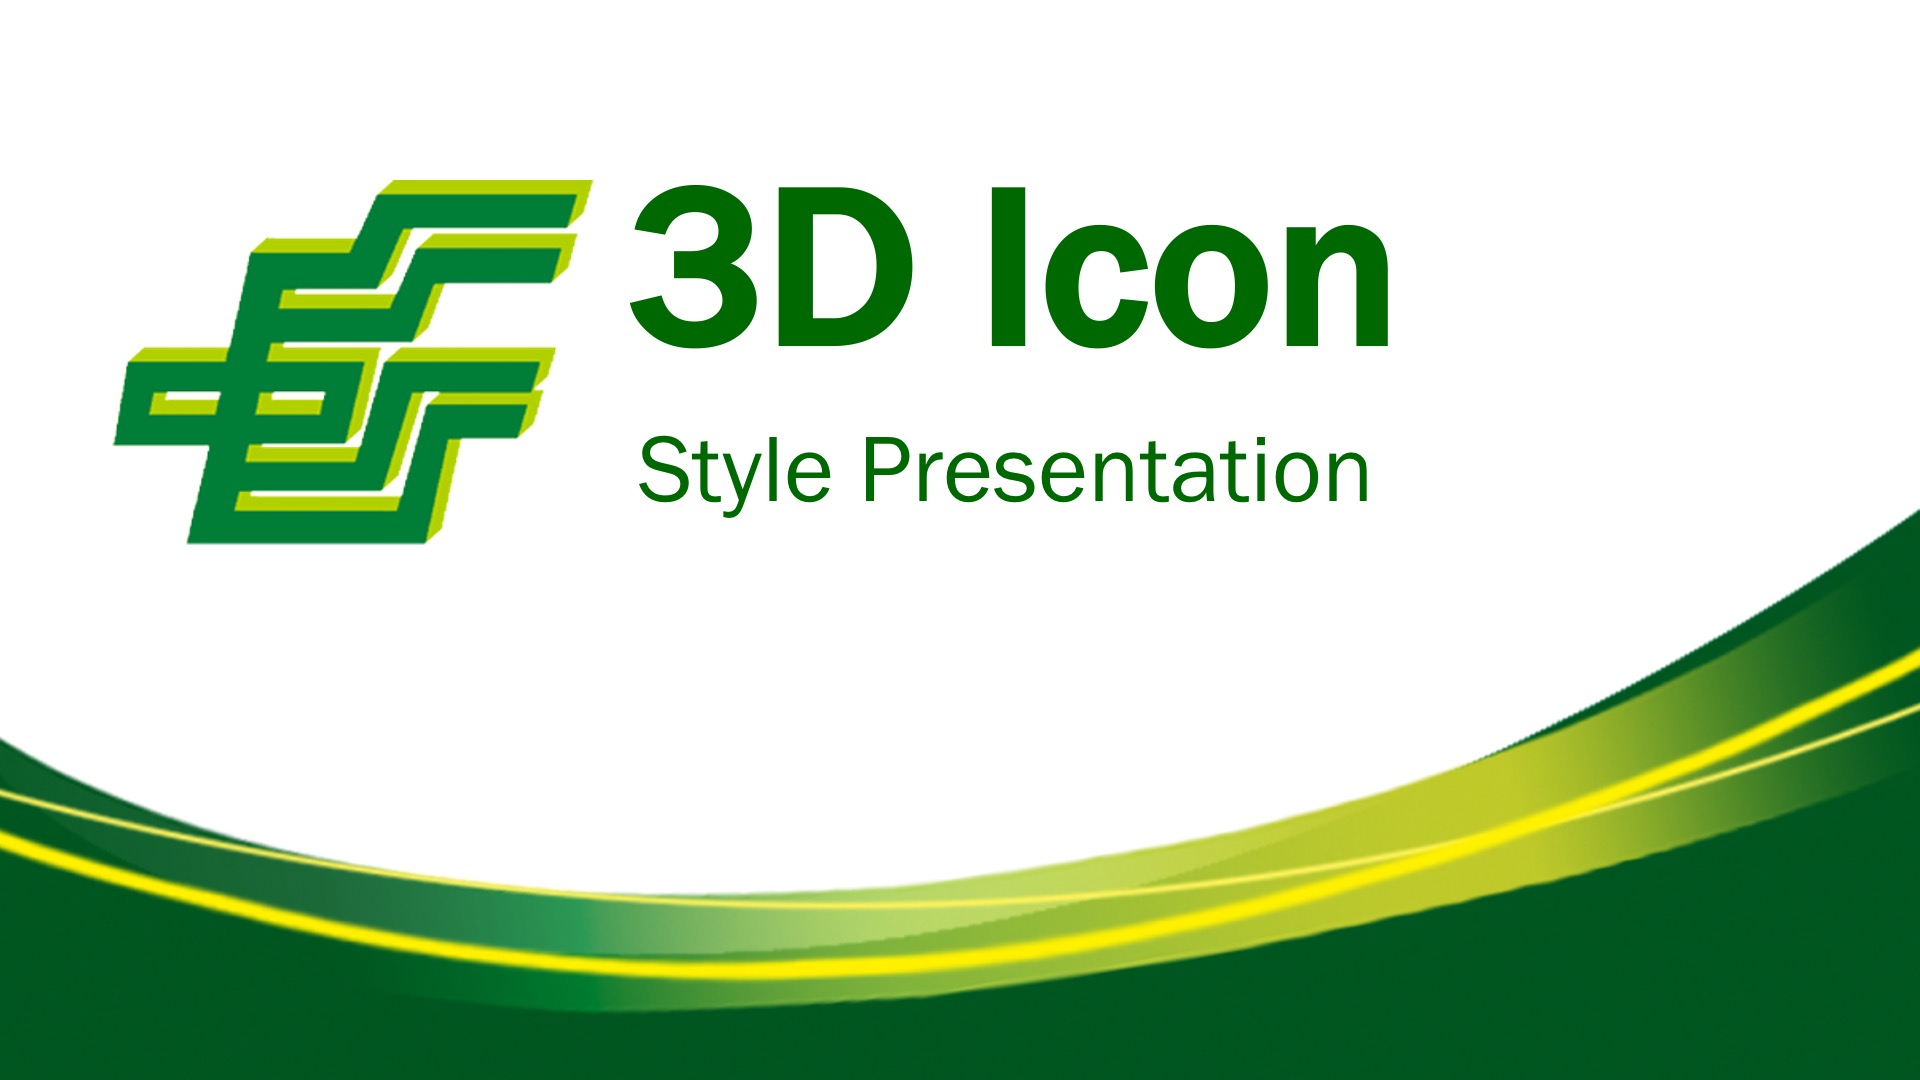 3D Icon Style Presentation